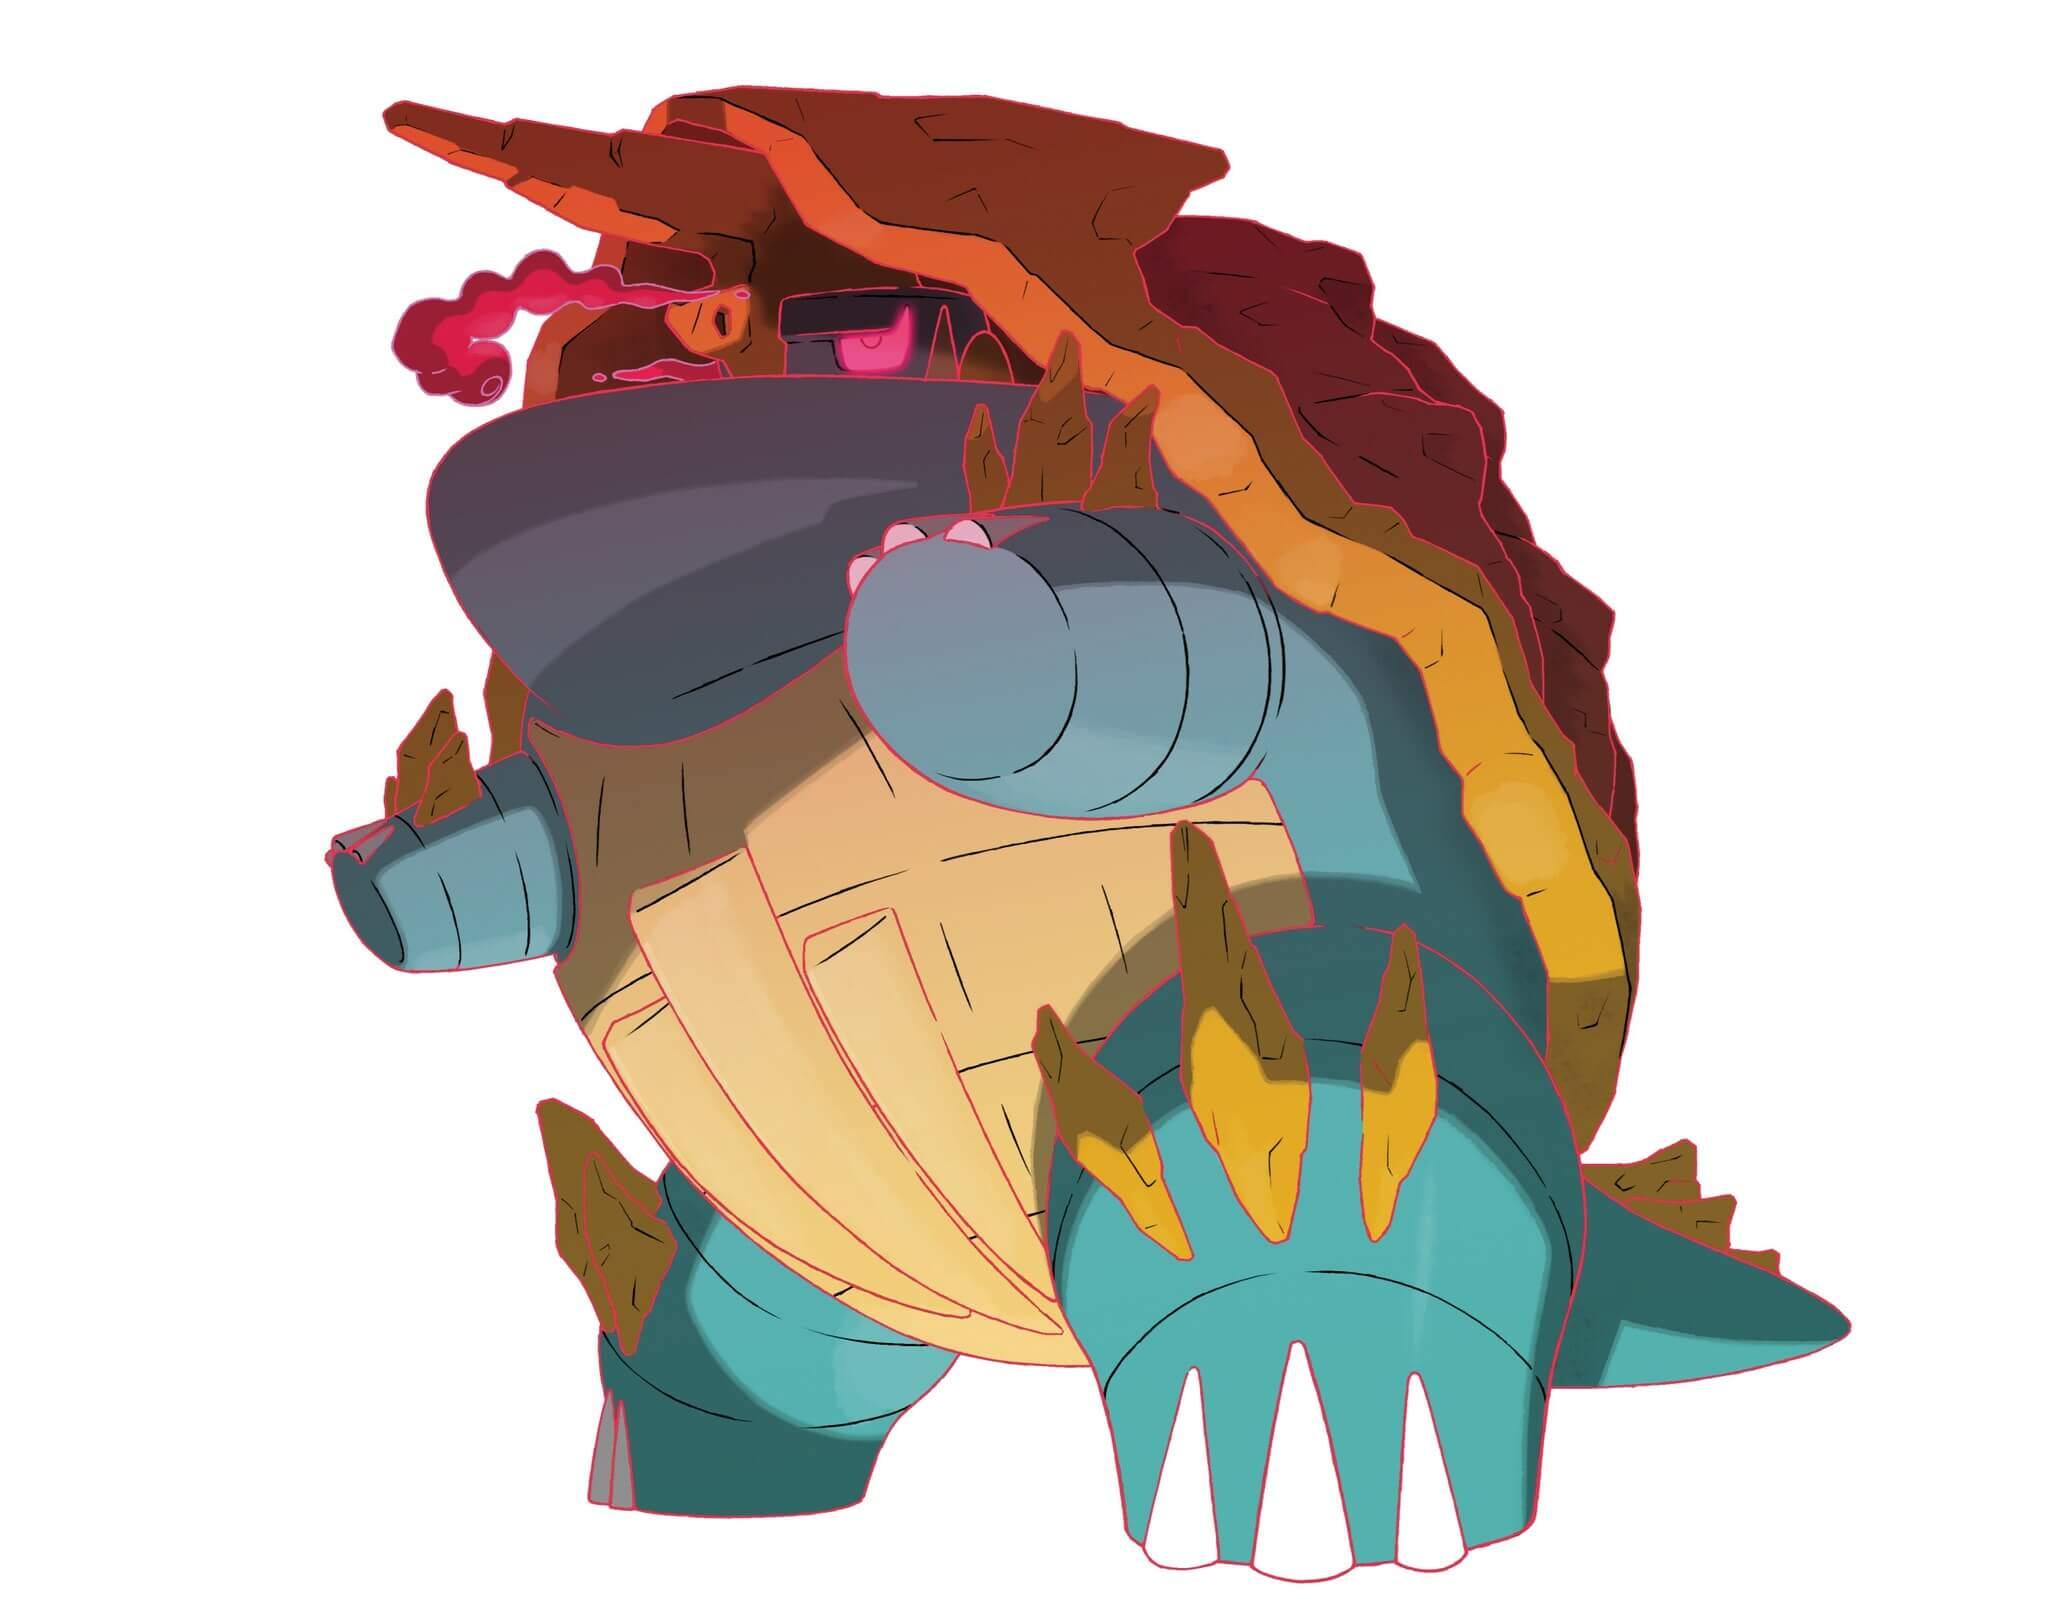 Pokémon Espada y Escudo Gigamax 4